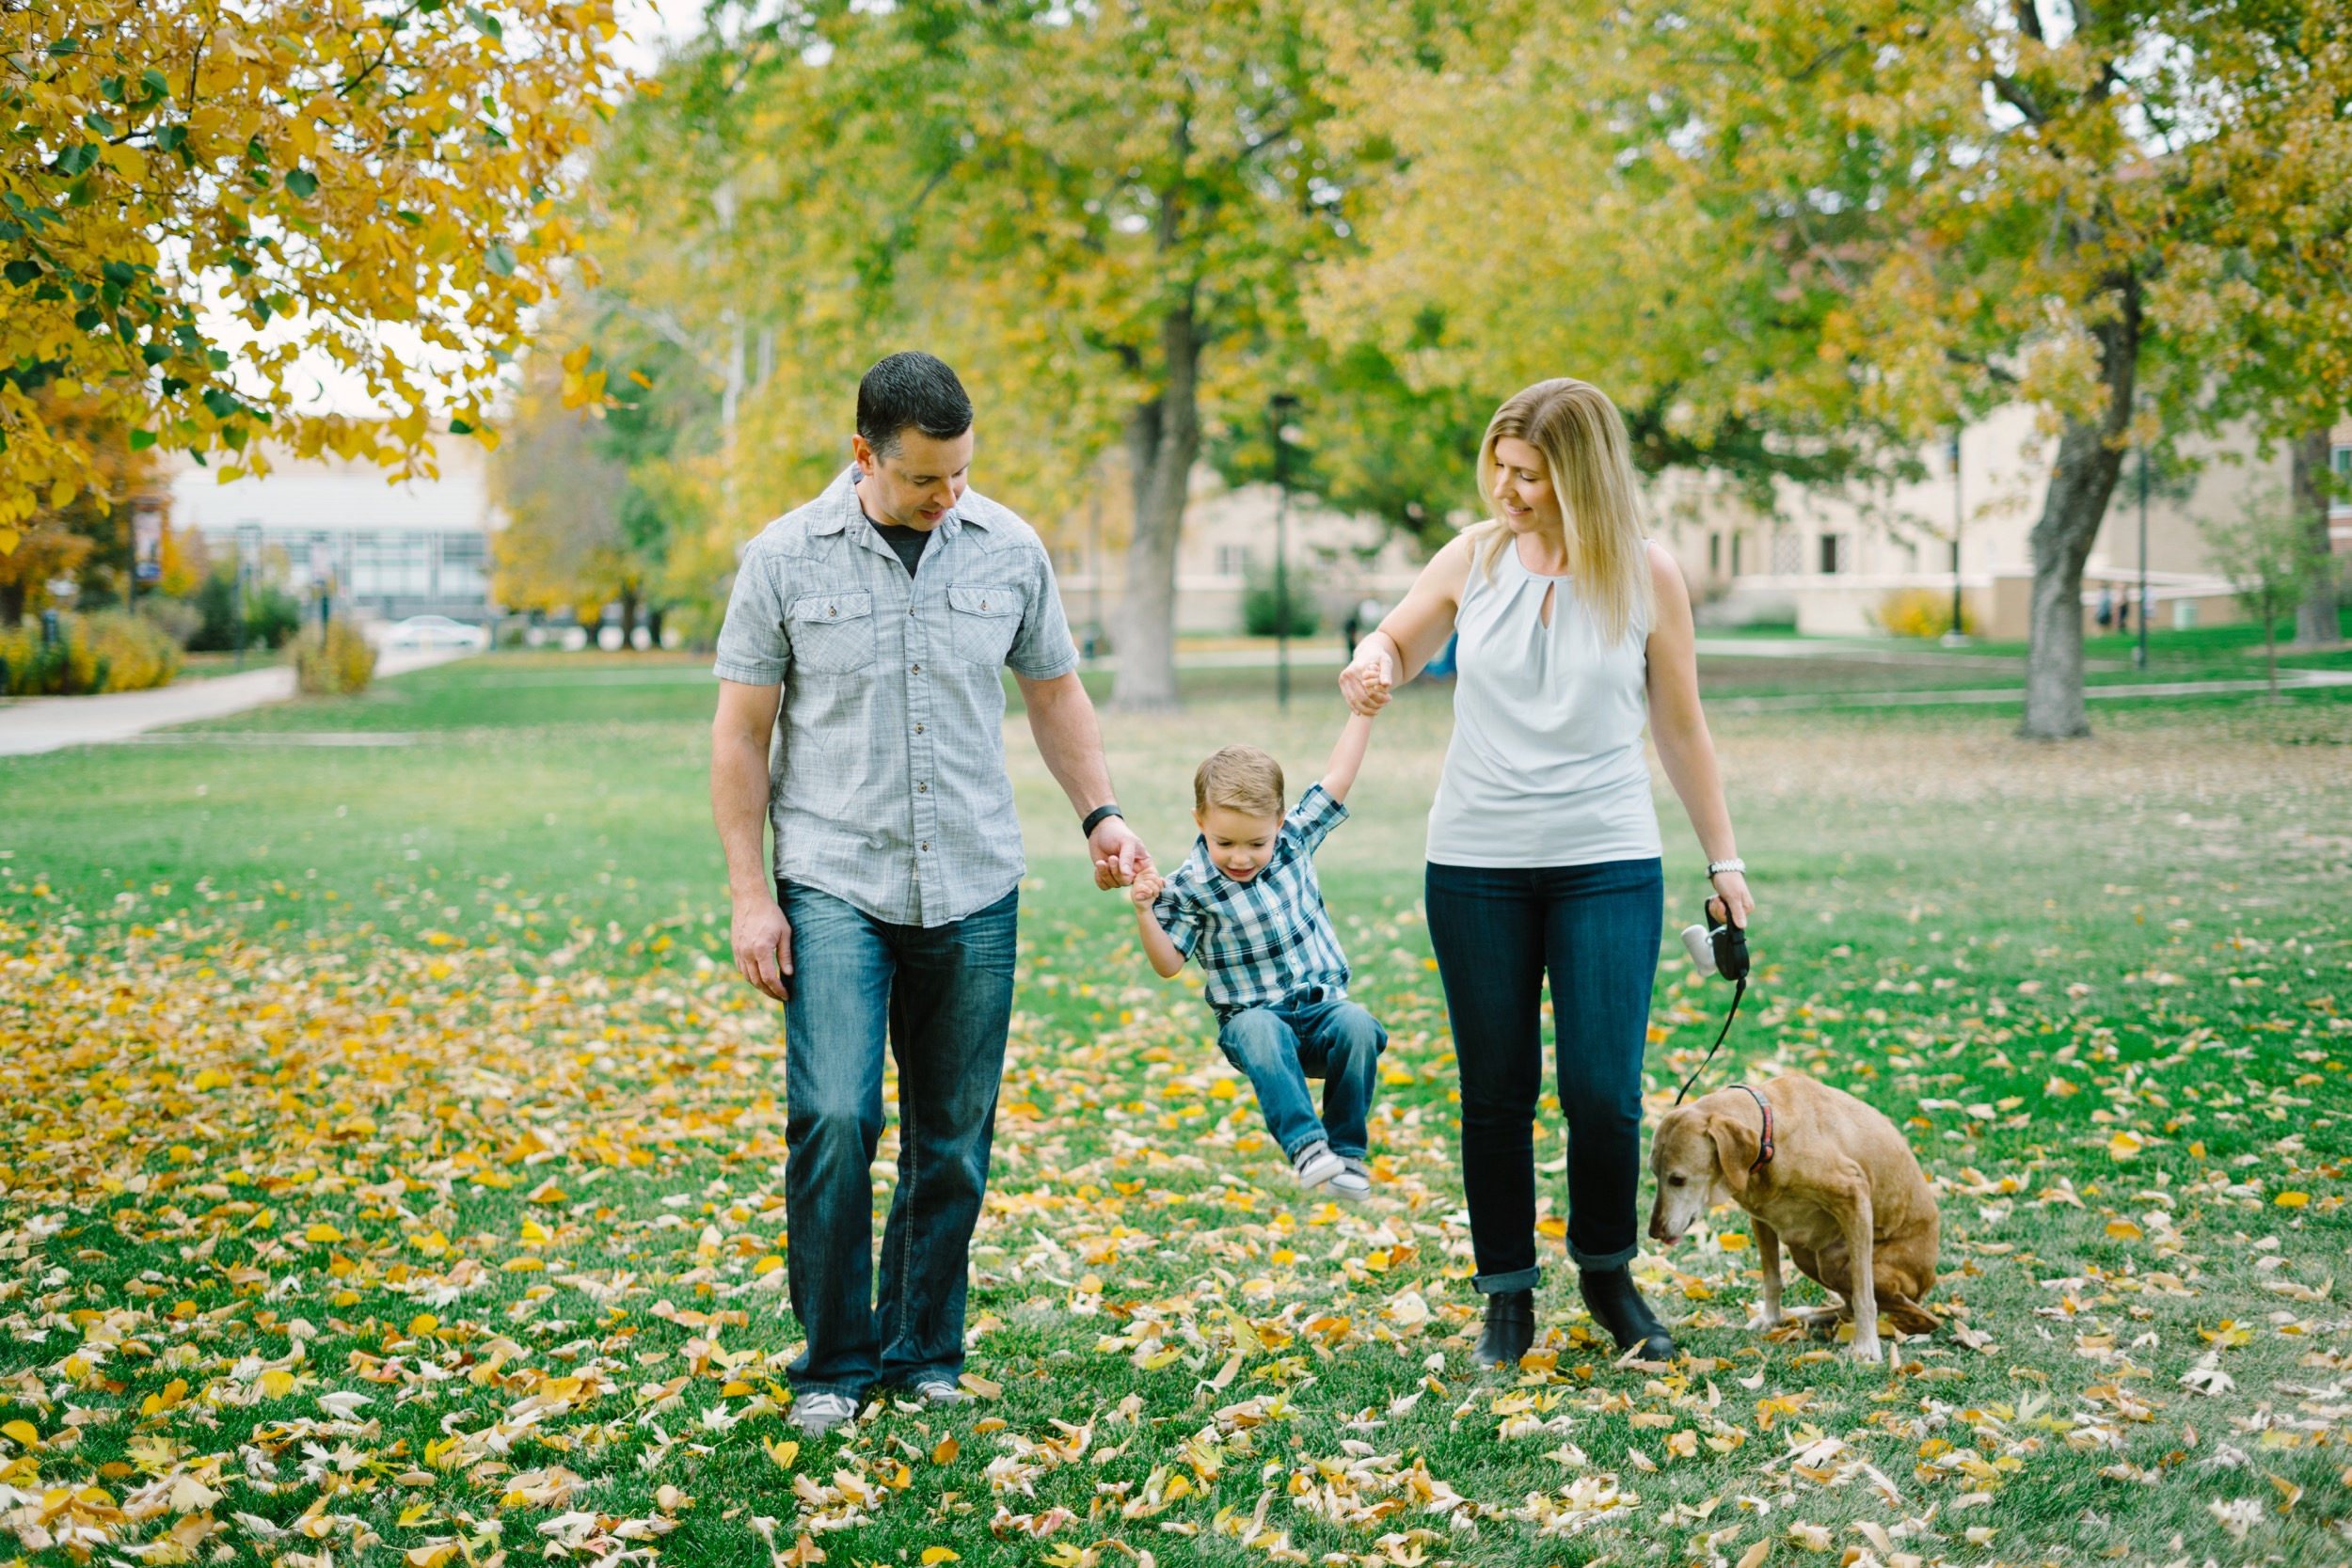 Denver Family Photography Dr. Bates - 5.jpg